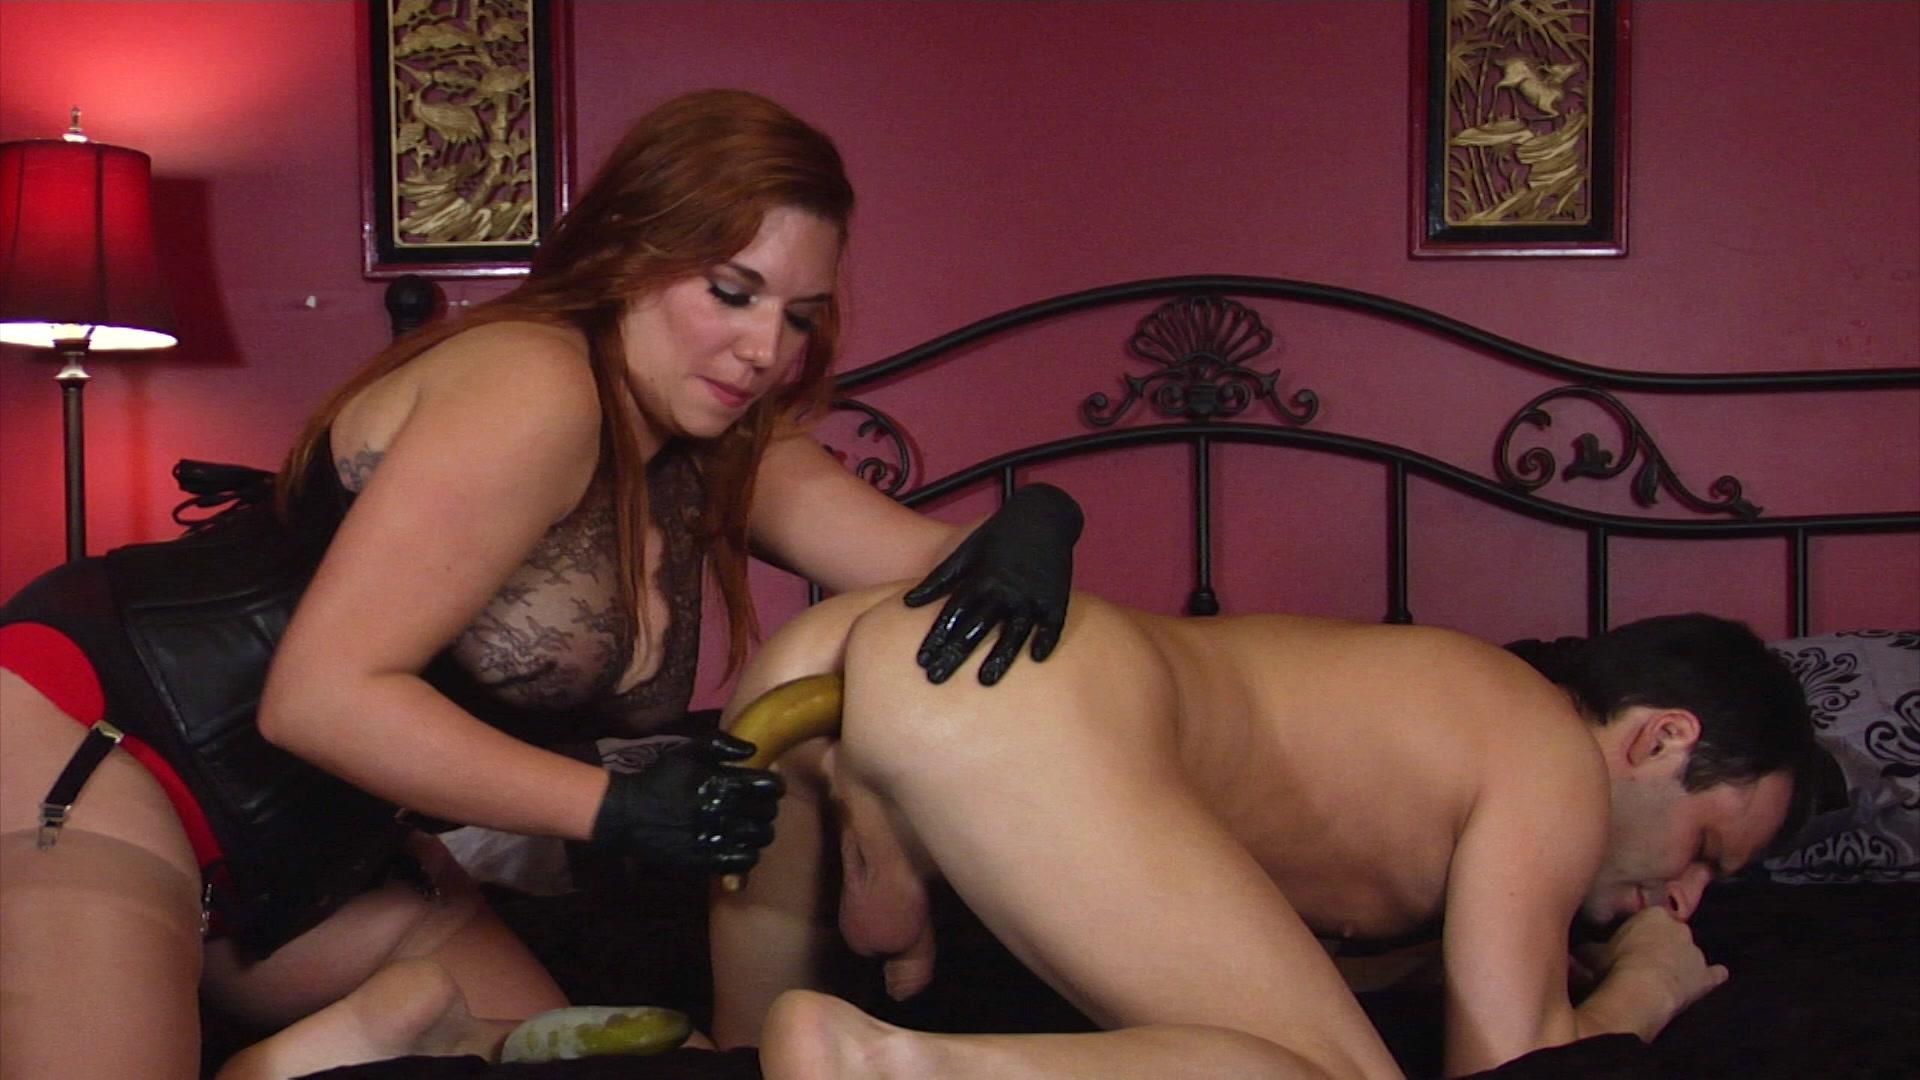 Anal first time porn video obscene hotties groan